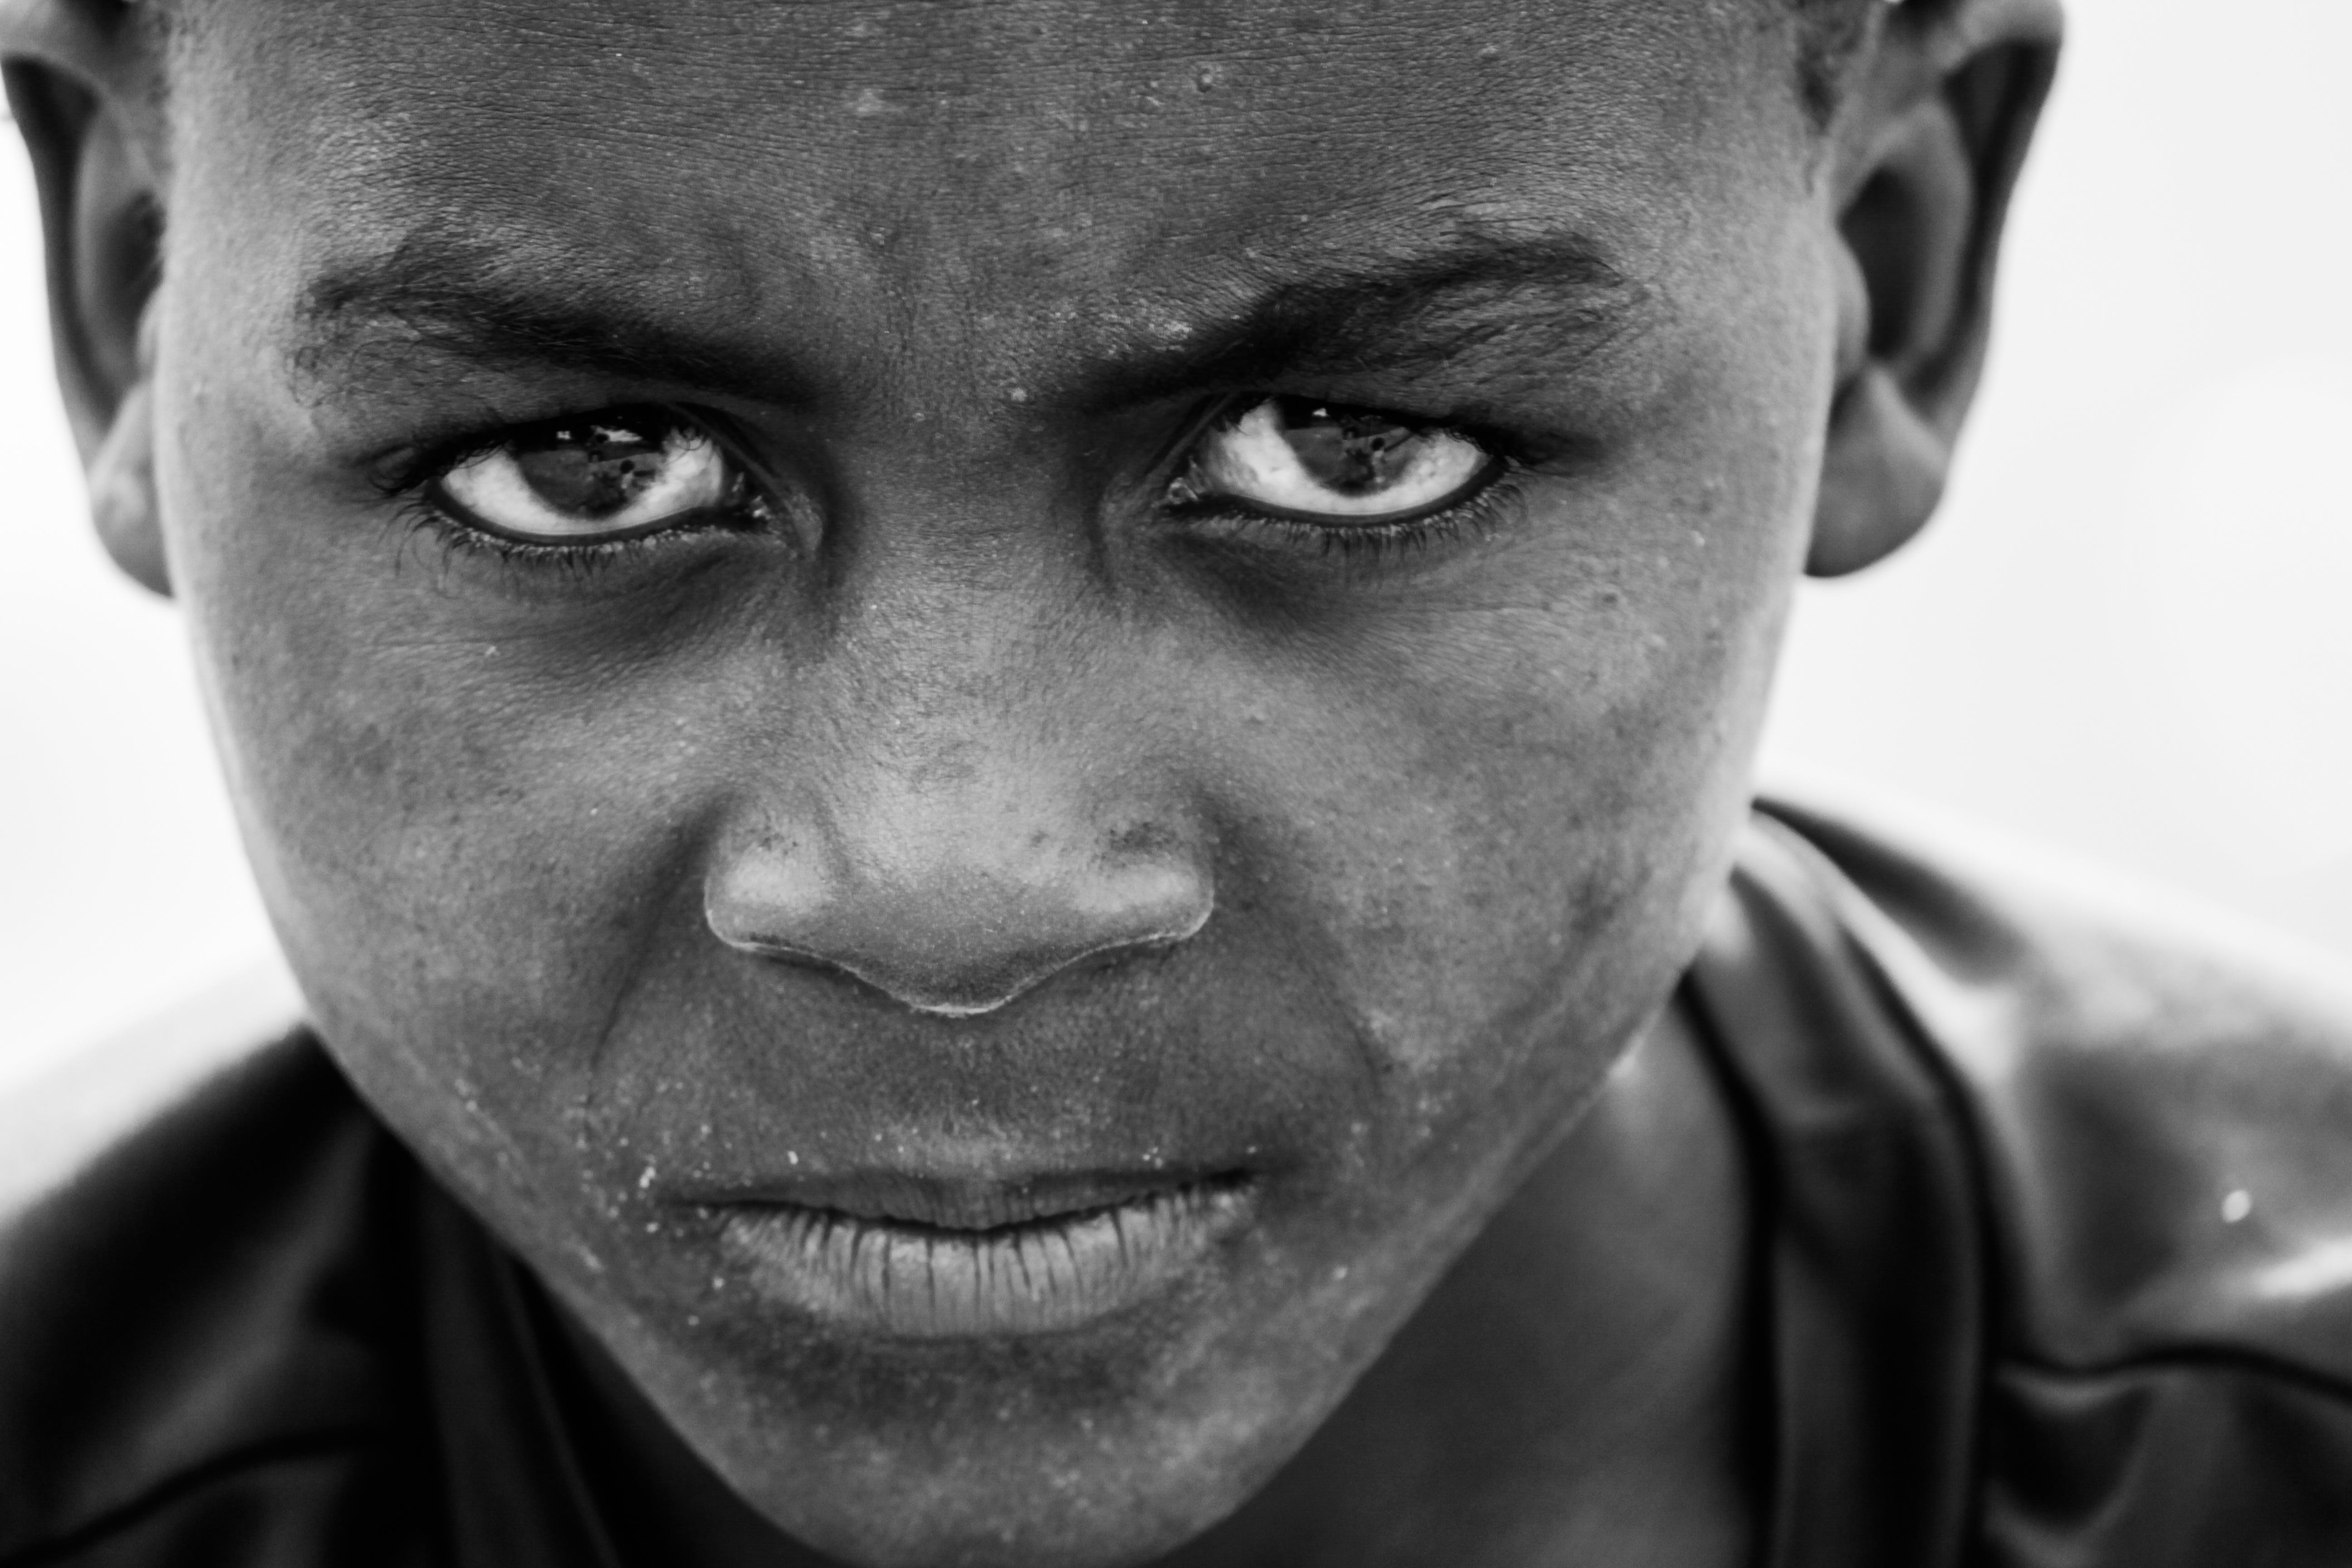 Boy's Face Gray Scale Photo